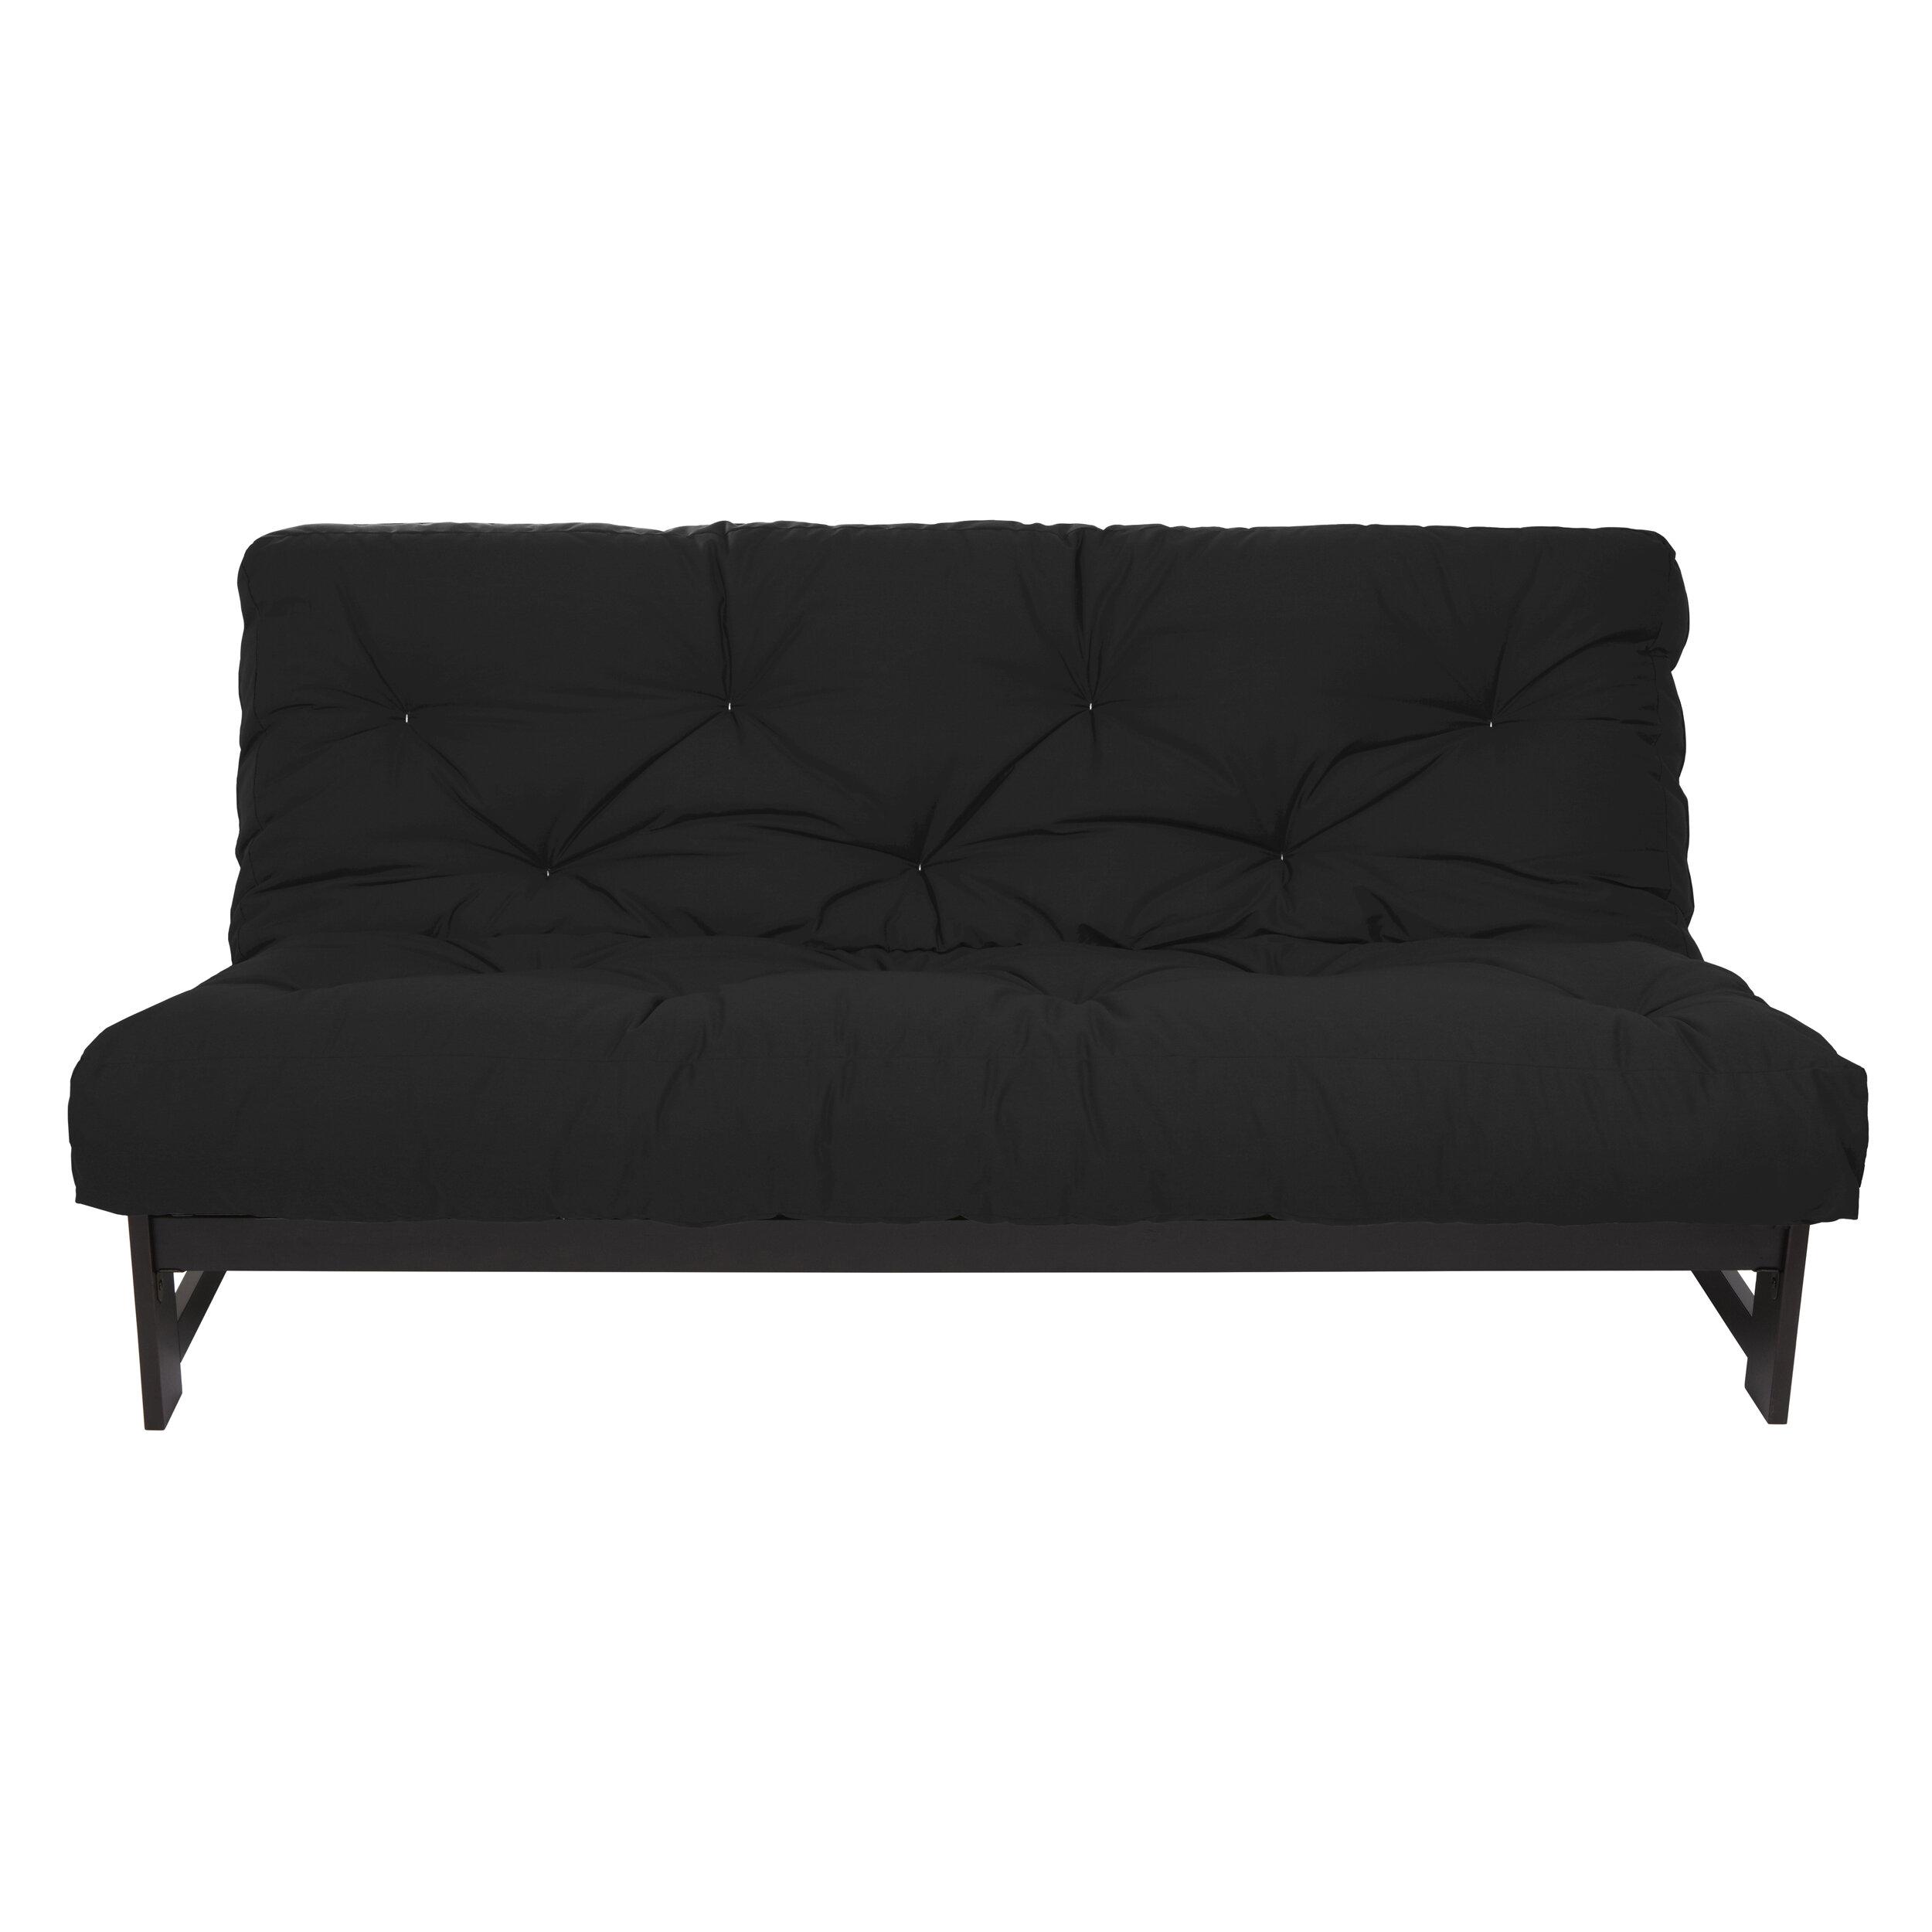 mozaic  pany 8   memory foam futon mattress  u0026 reviews   wayfair  rh   wayfair